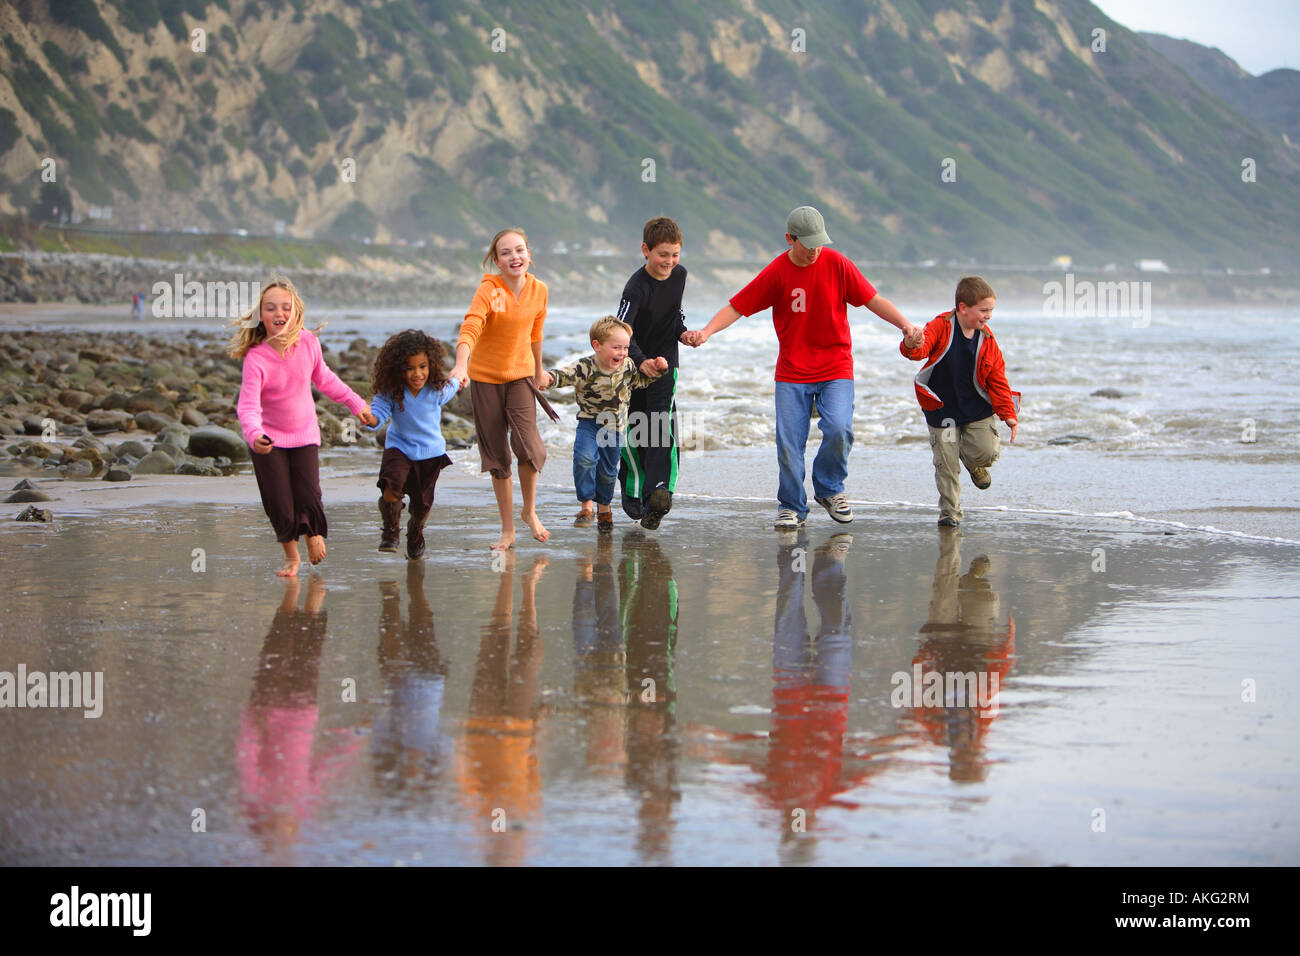 Children Running on Beach Mussel Shoals Carpenteria Santa Barbara County California United States (MR) - Stock Image